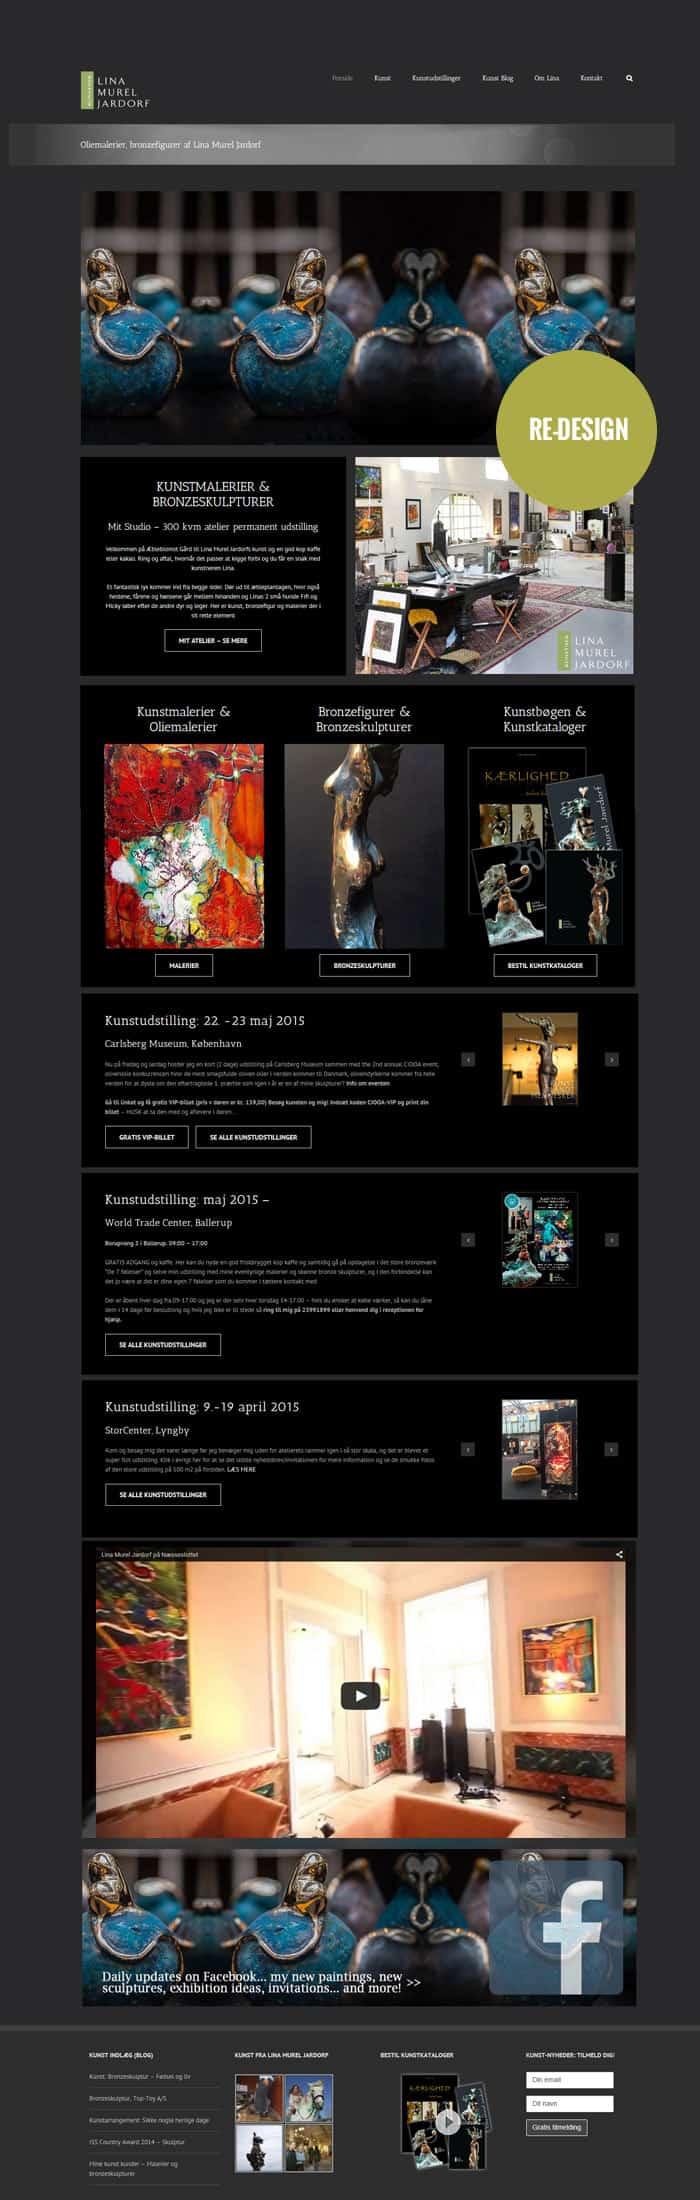 Avada Wordpress hjemmeside, Linaart.dk efter bizdoktor re-design